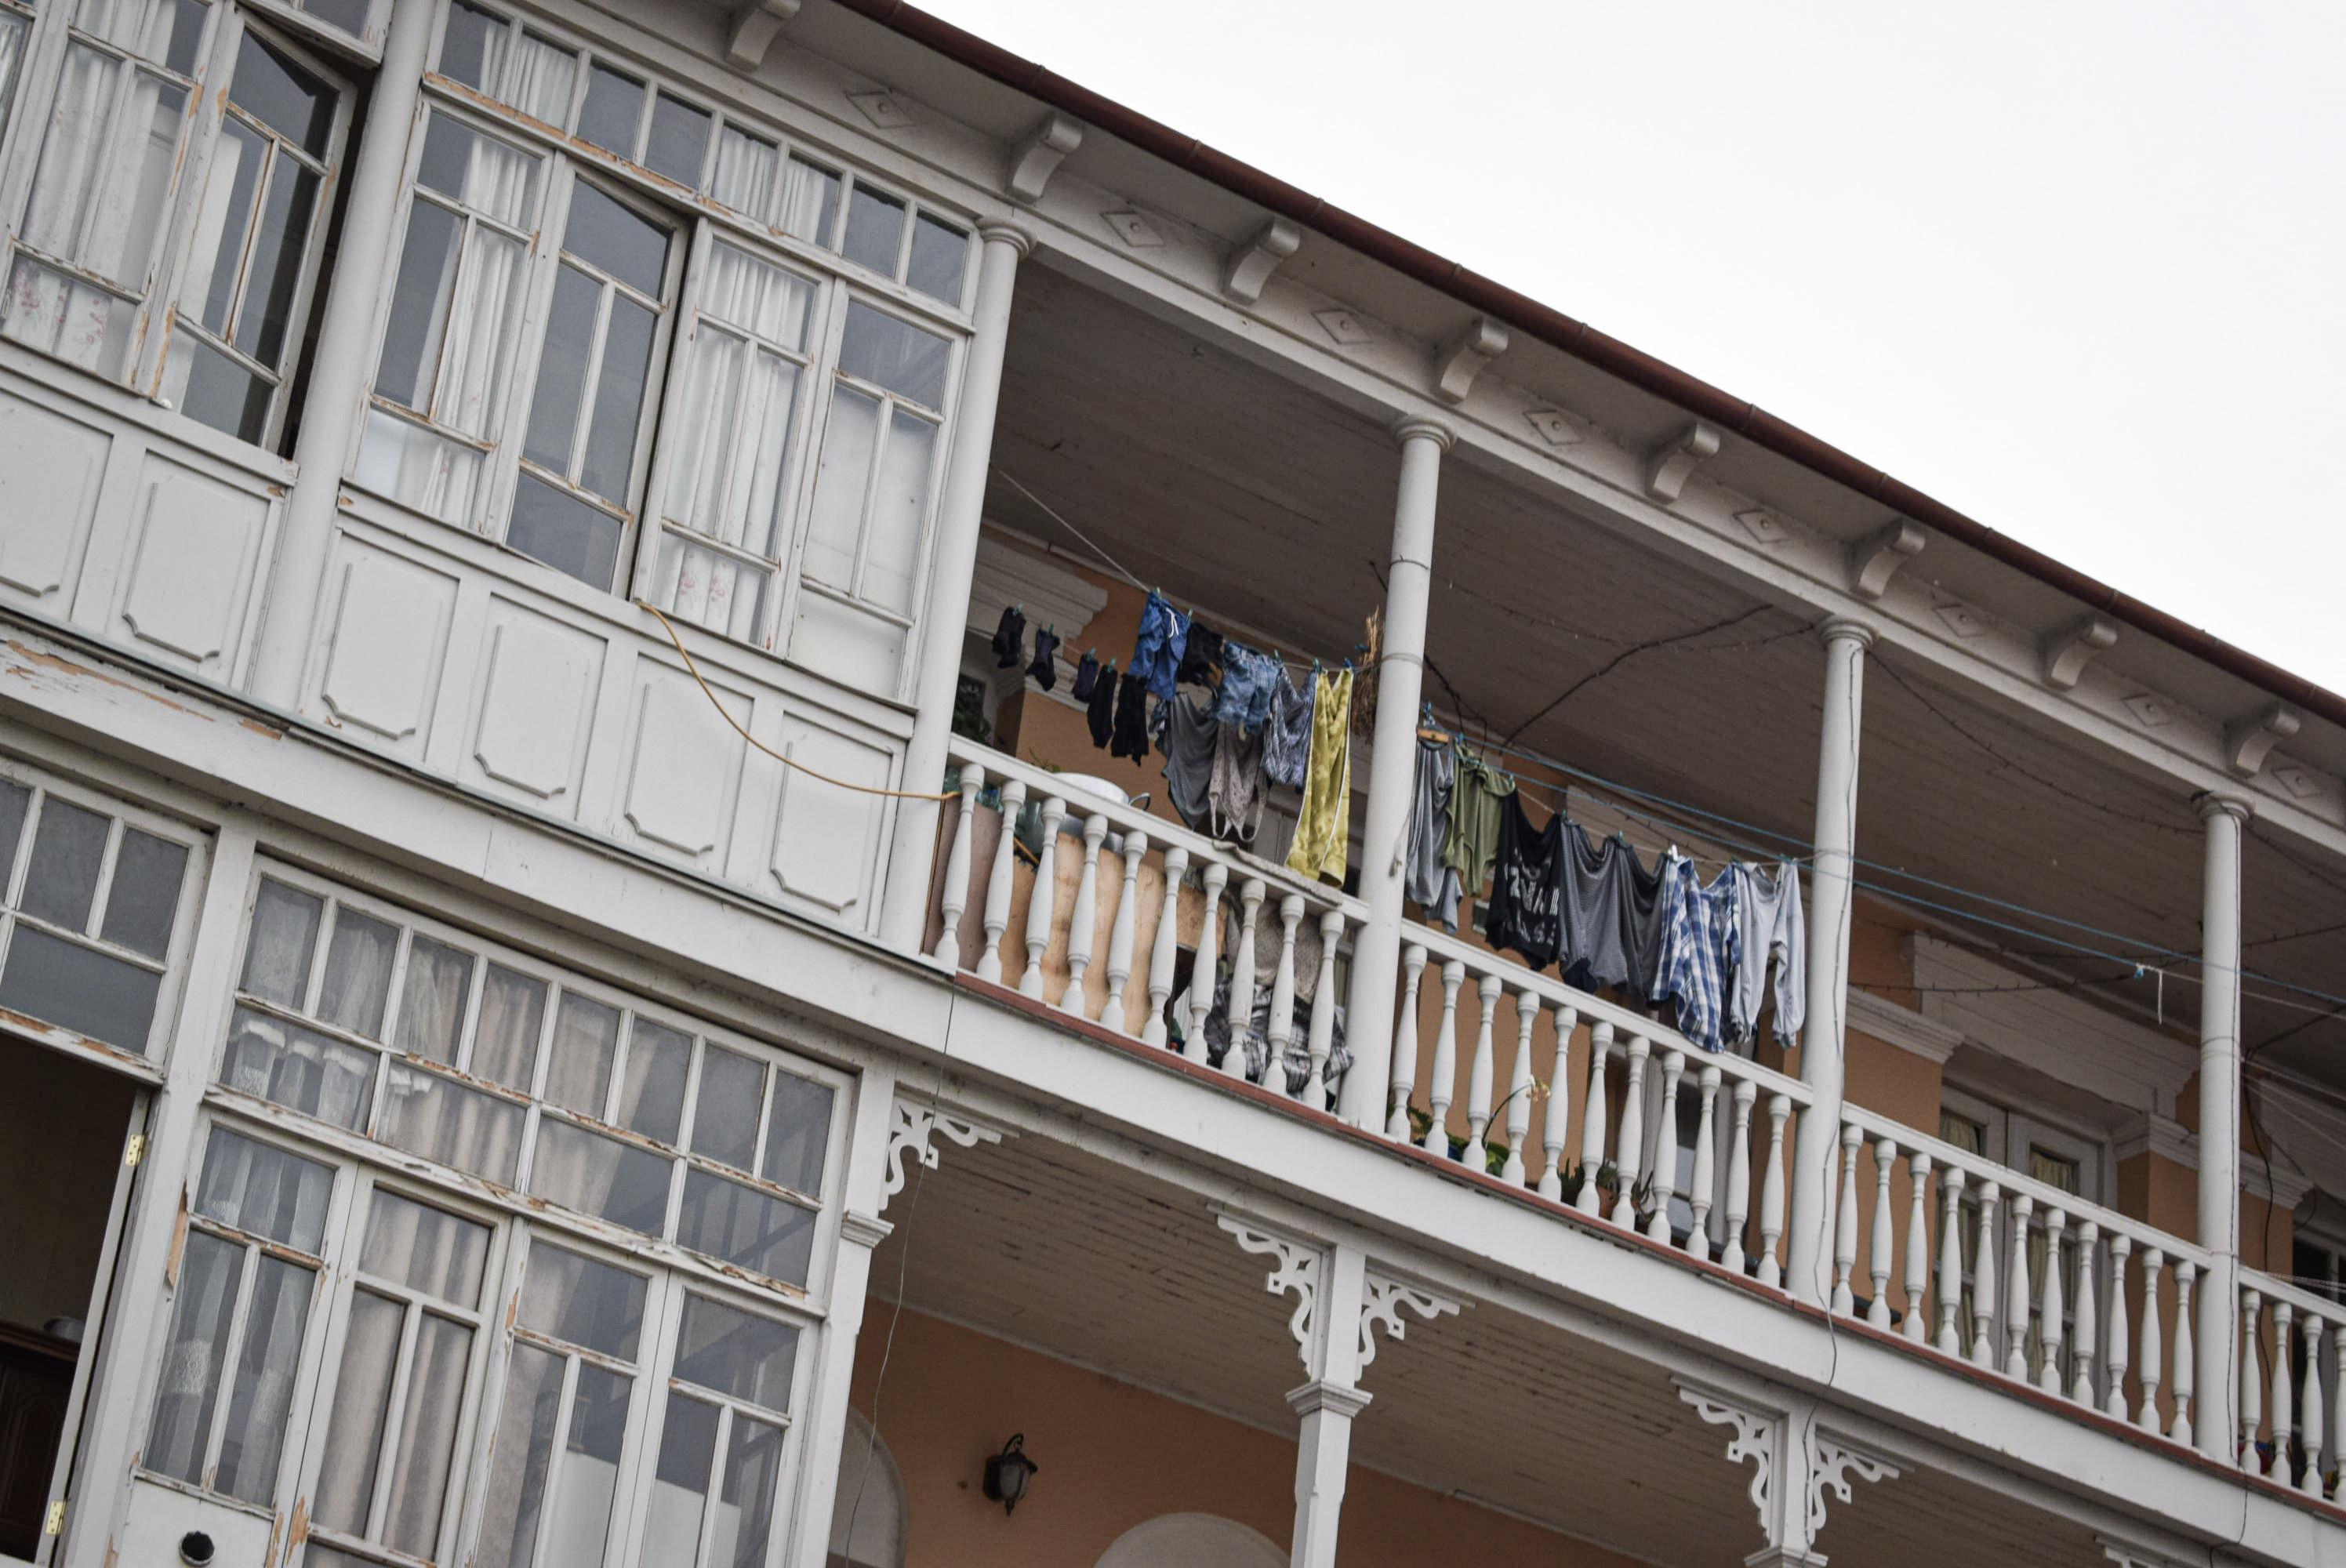 Typische Tbilisi en Georgische Balkonnetjes